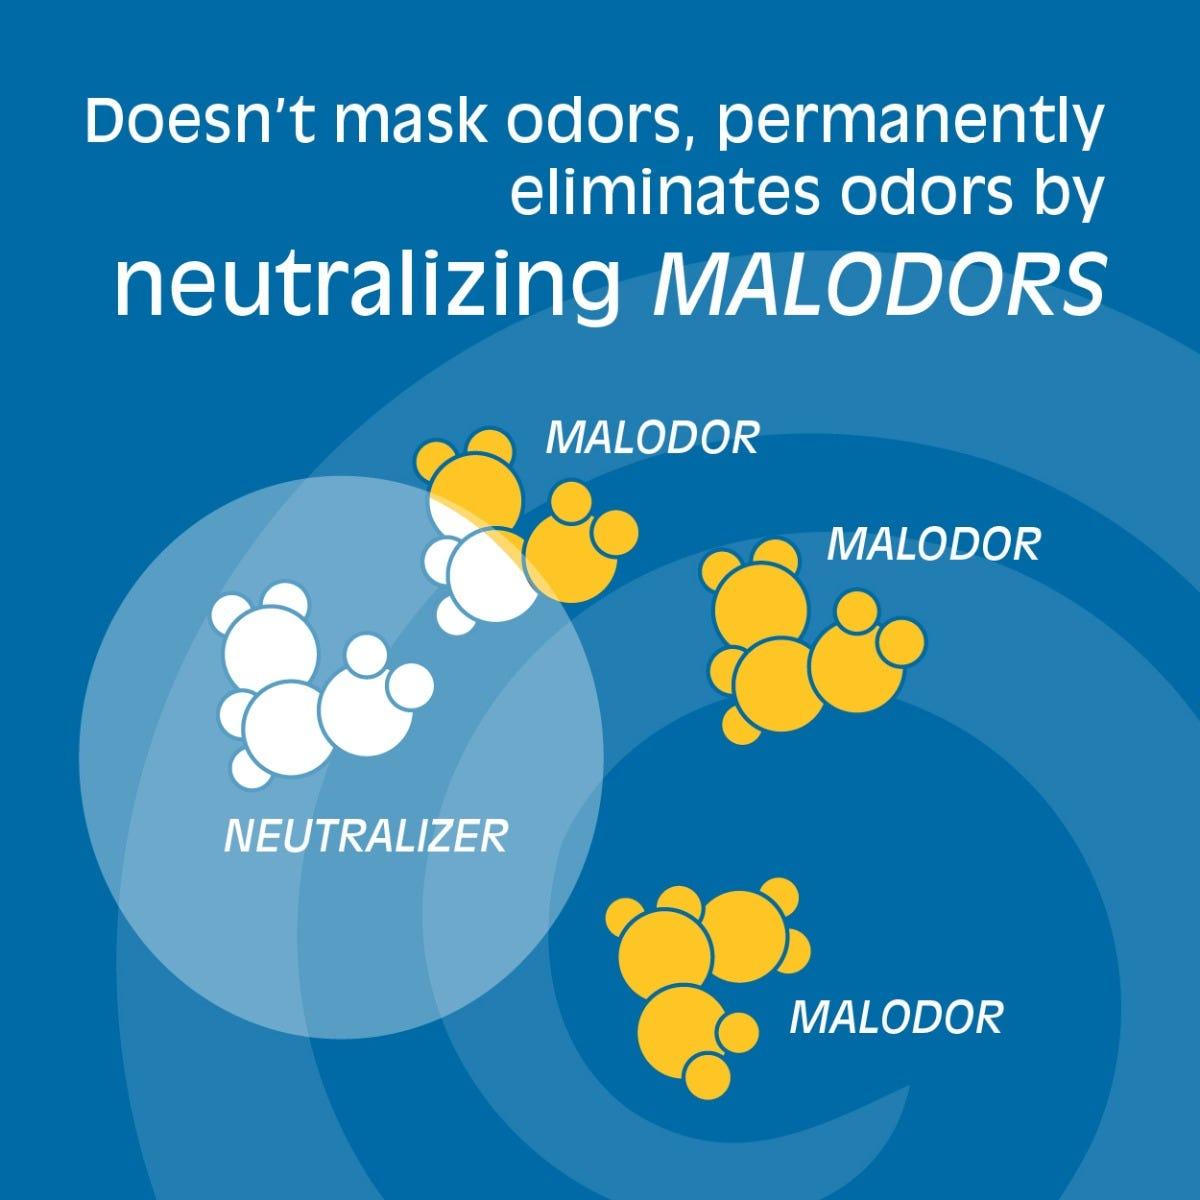 Malodor neutralizer